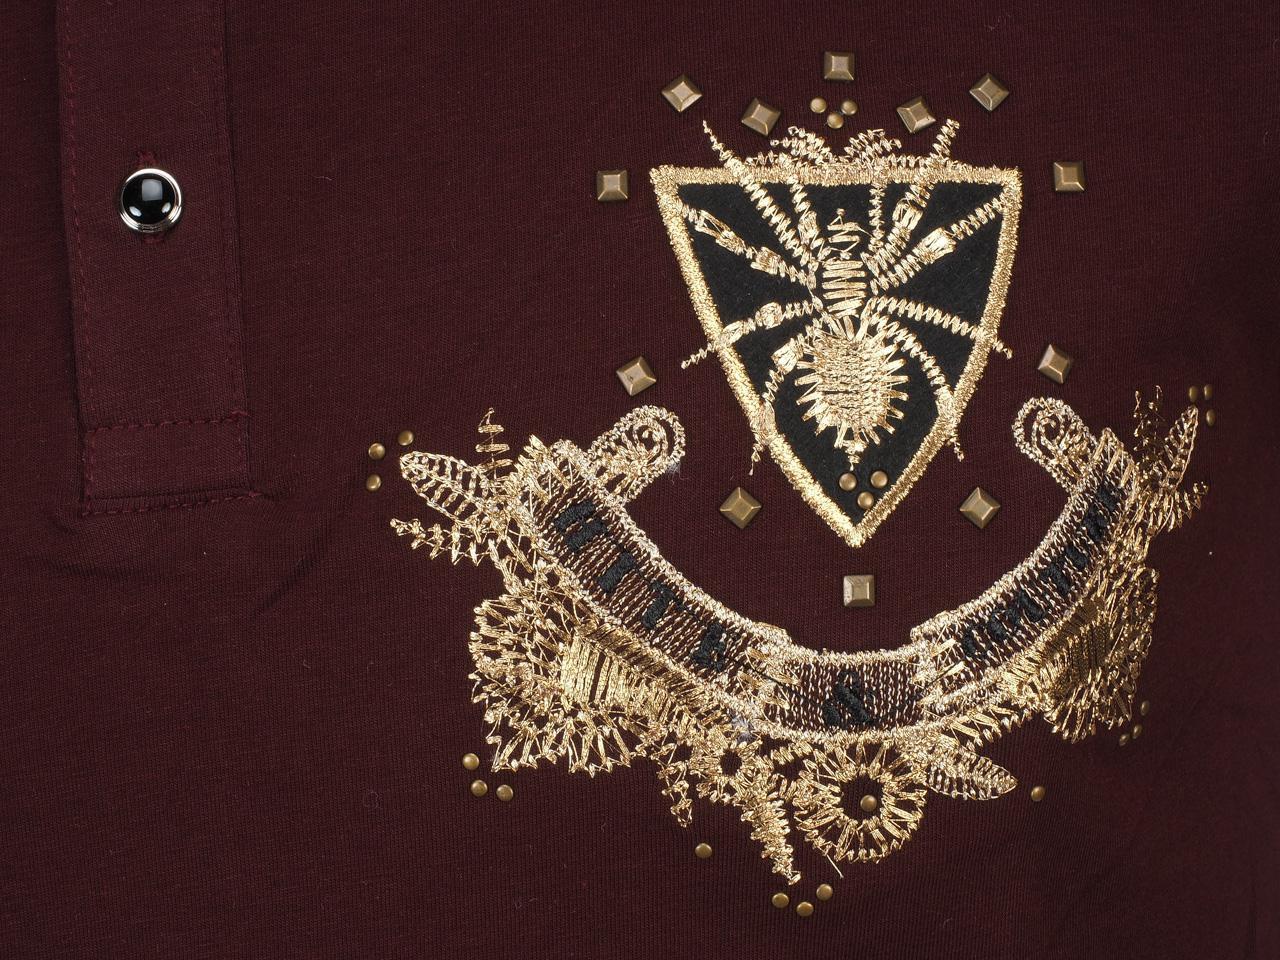 Short-Sleeve-Polo-Hite-Couture-Pamiler-Bordeaux-Mc-Polo-Red-11573-New thumbnail 3